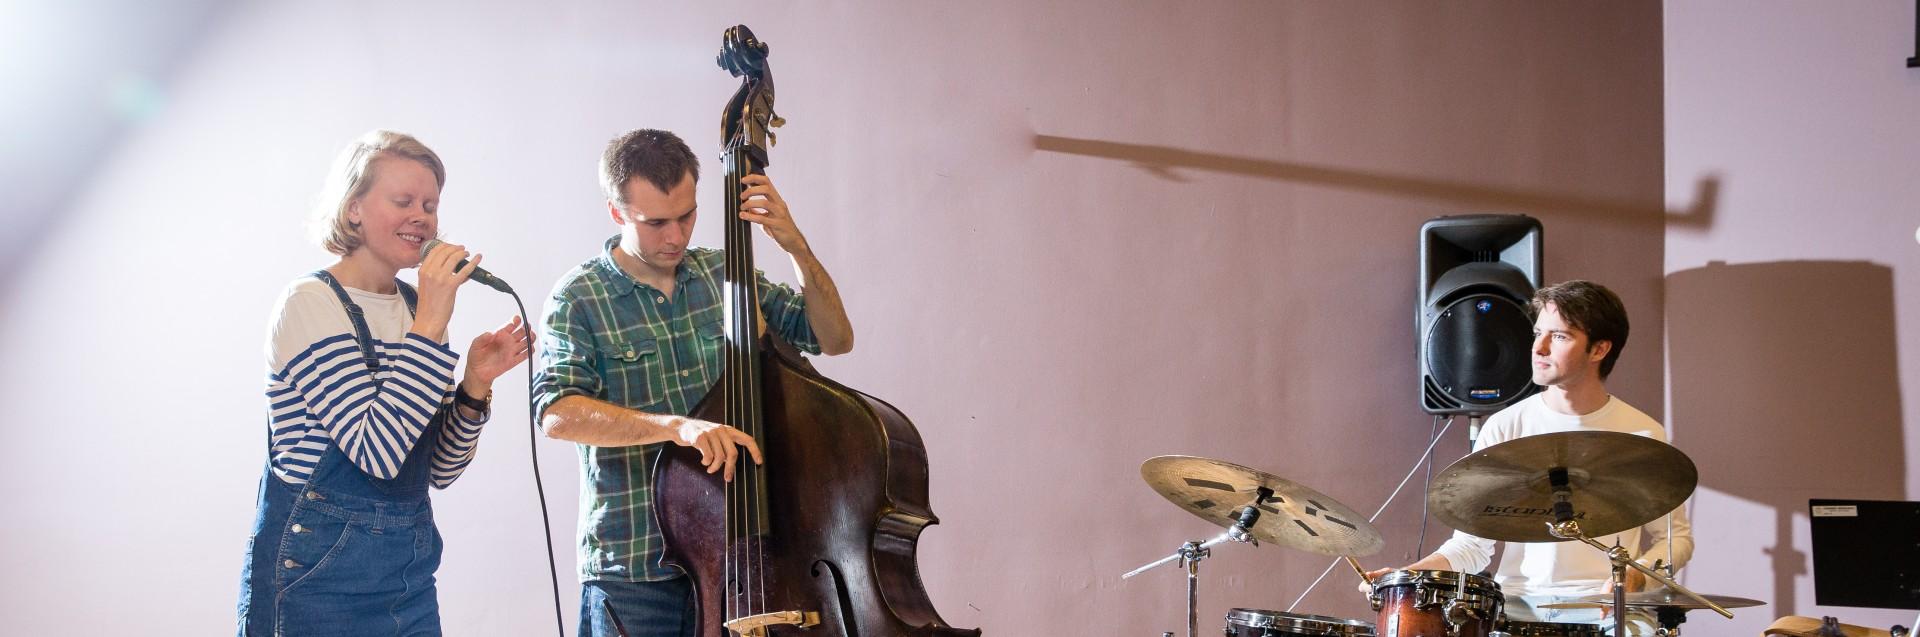 Jazzstudenter ved Fakultet for utøvende kunstfag. Foto: Marius Vervik